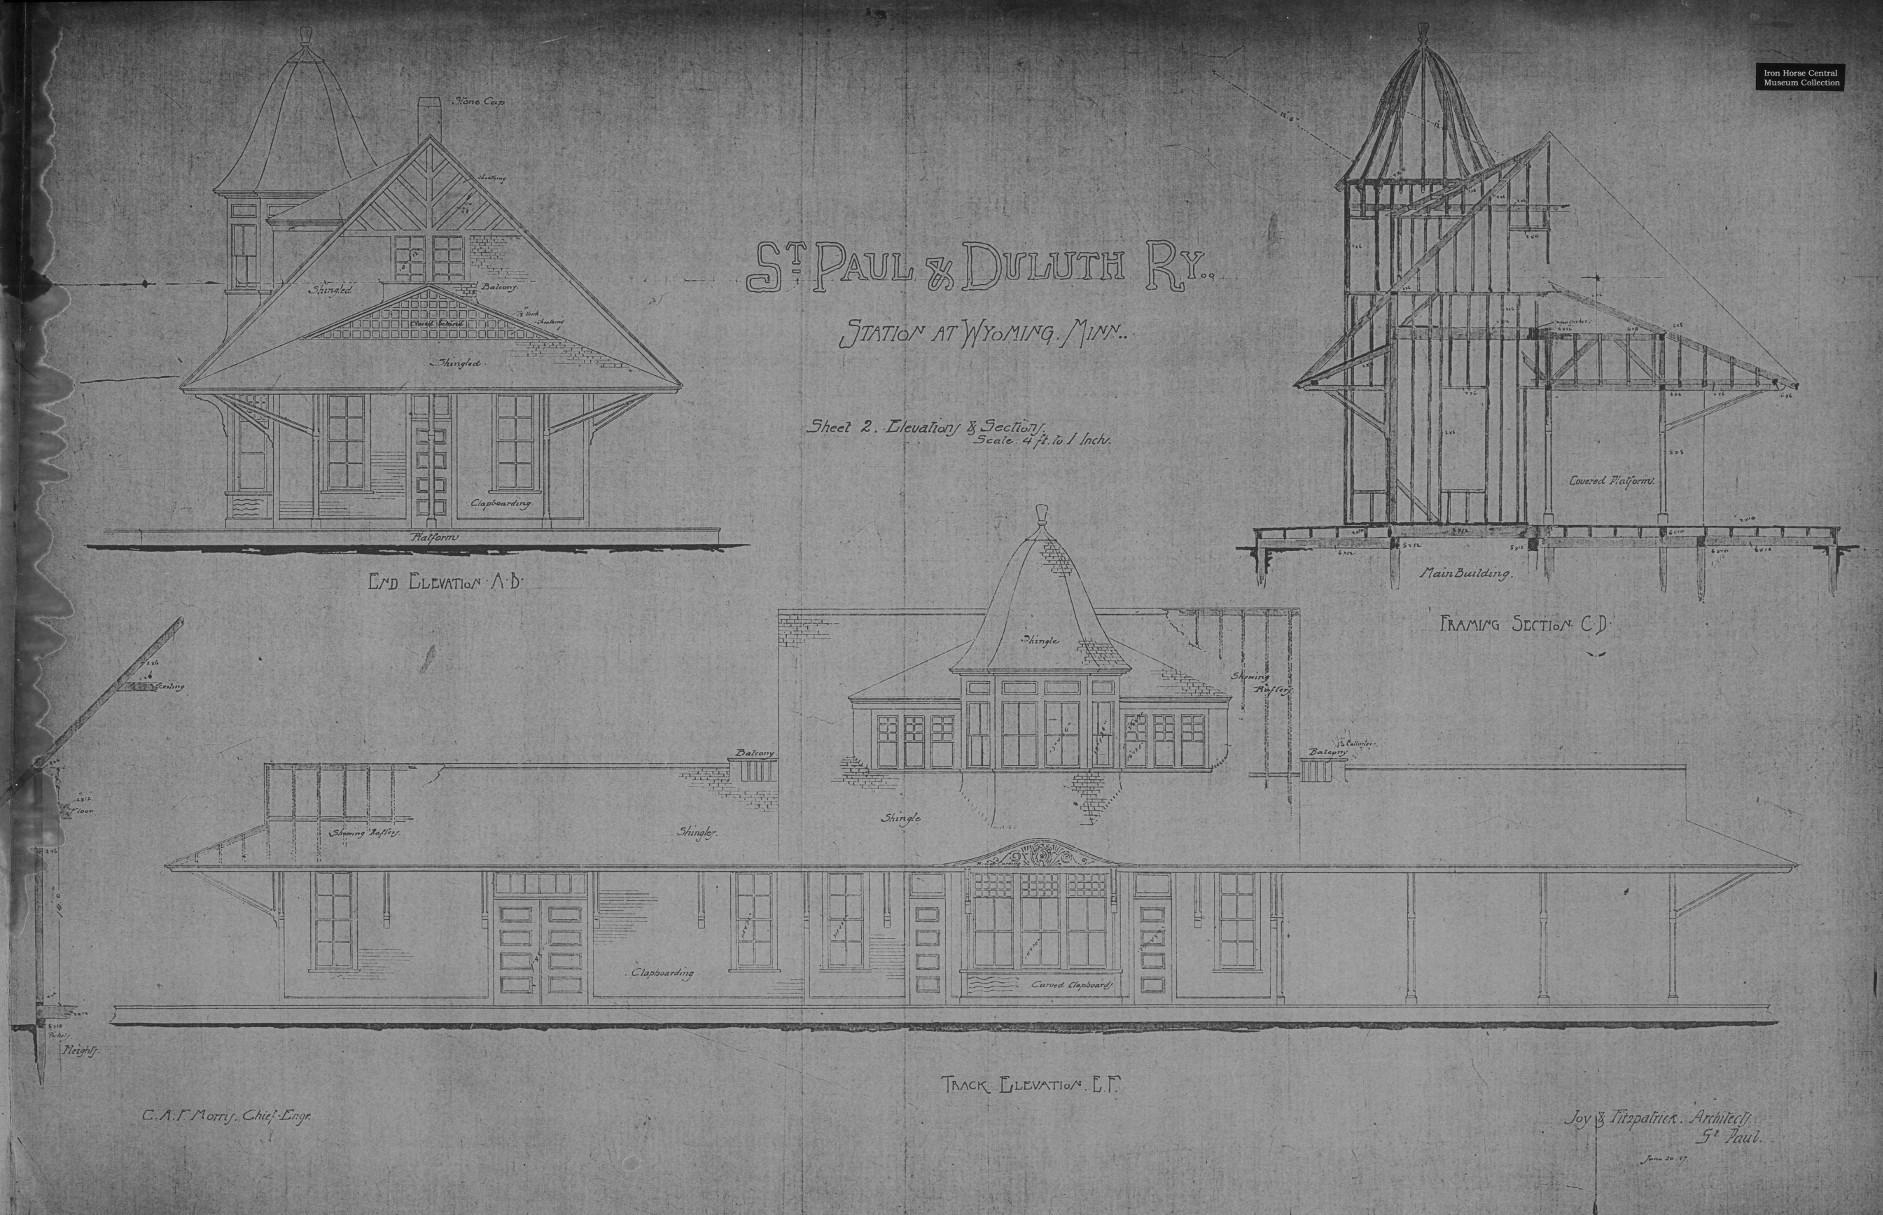 Wyoming Depot Blueprints